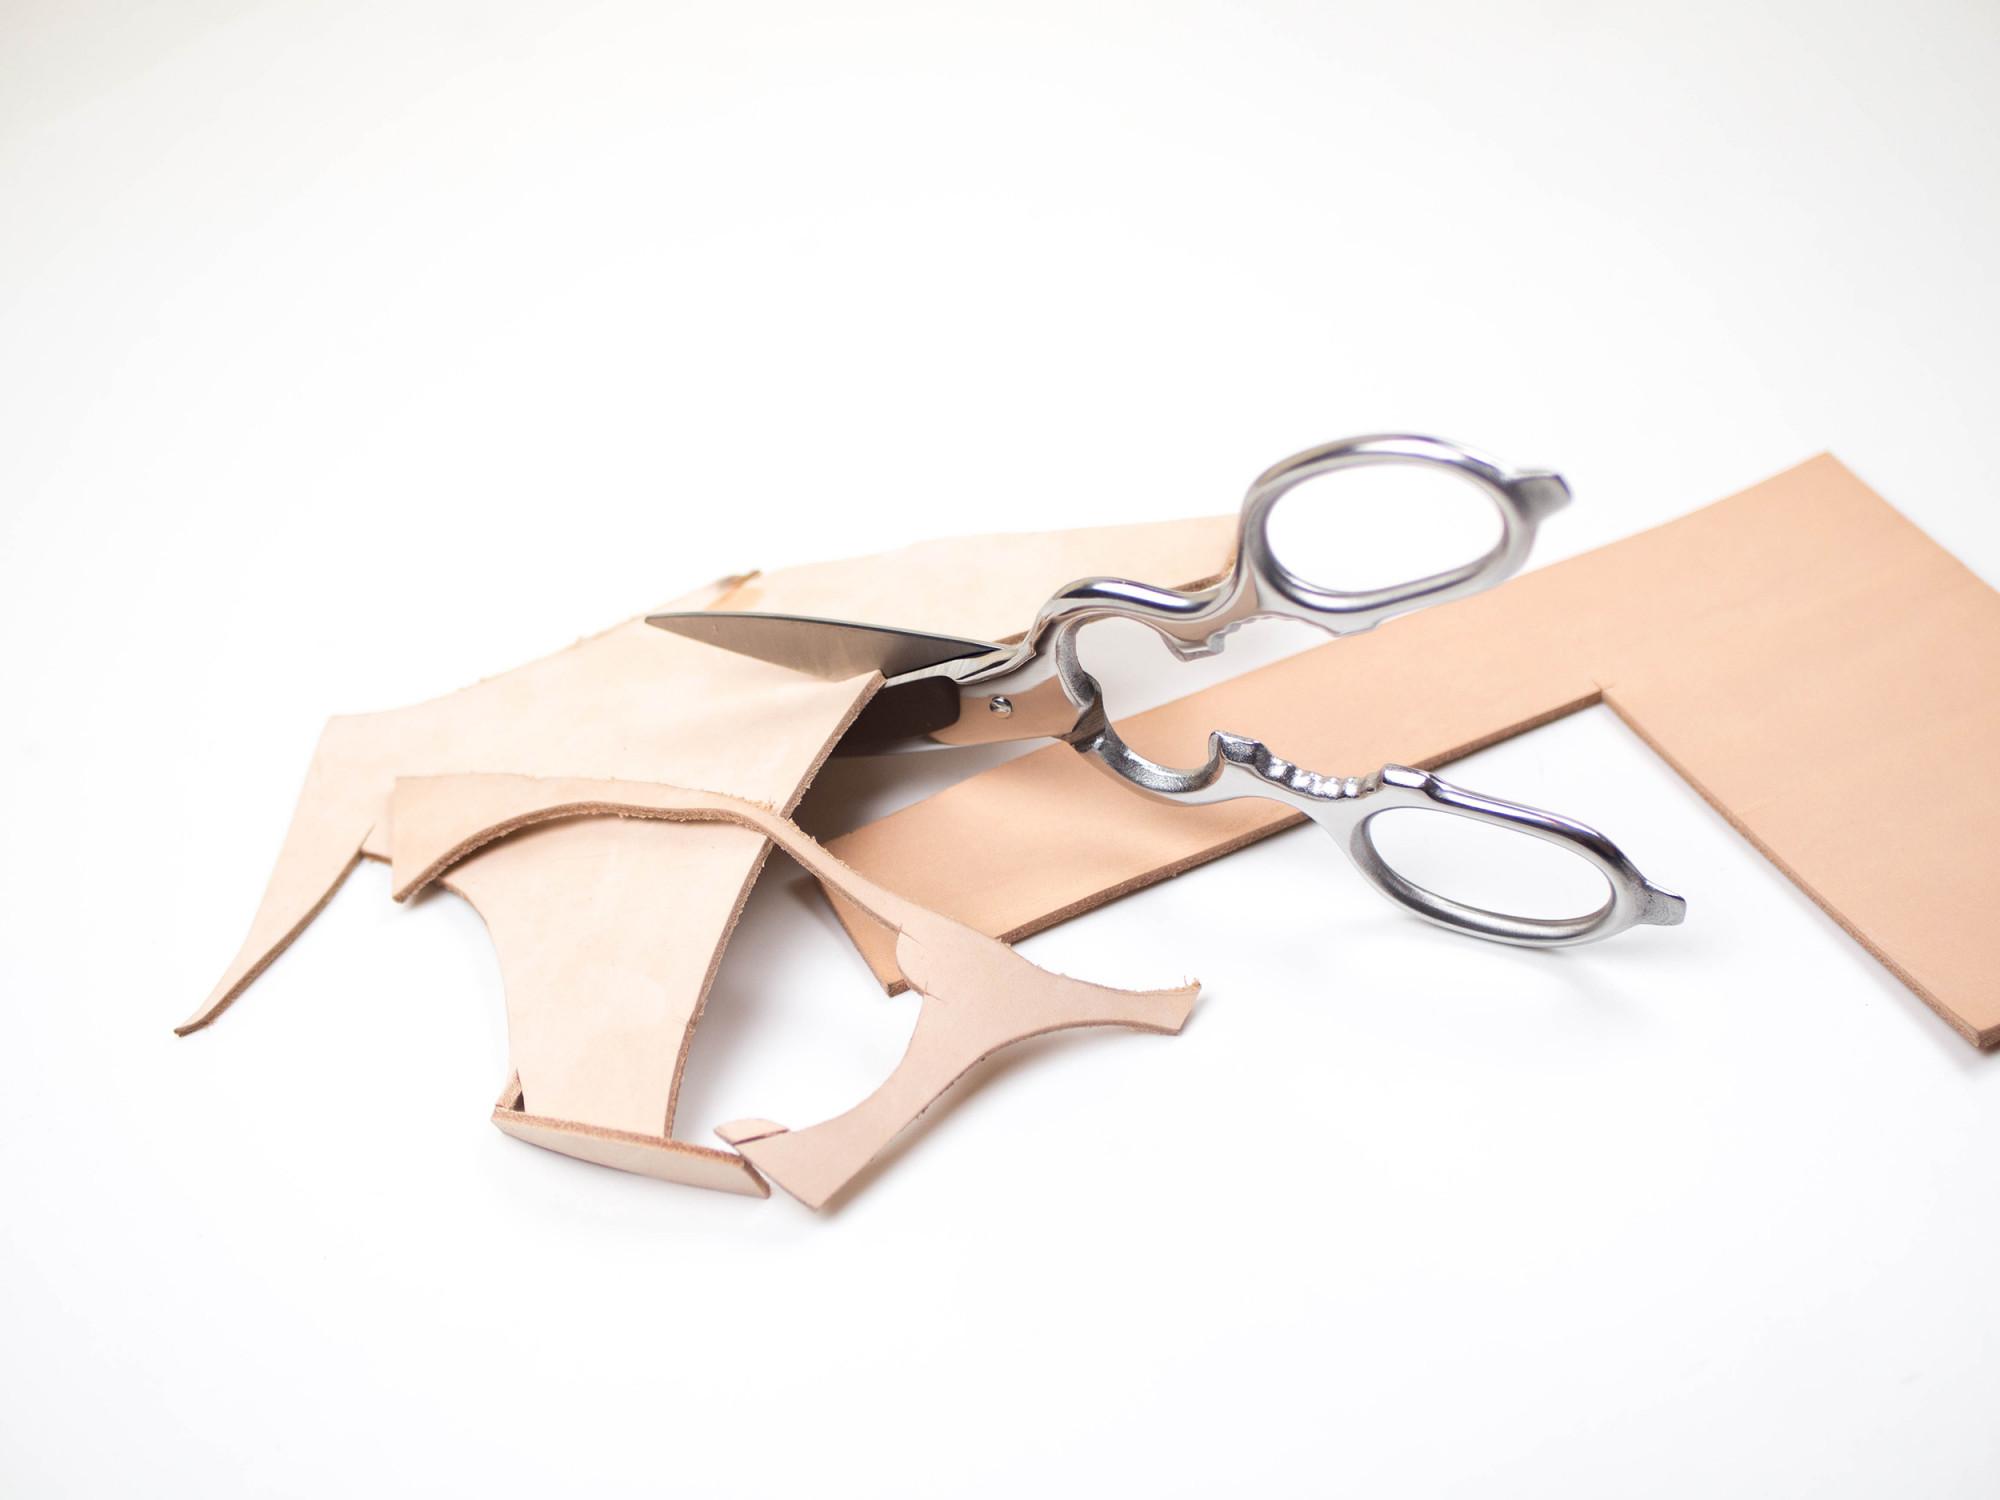 Japanese Scissors Sakai Kyuba x Japana Kitchen